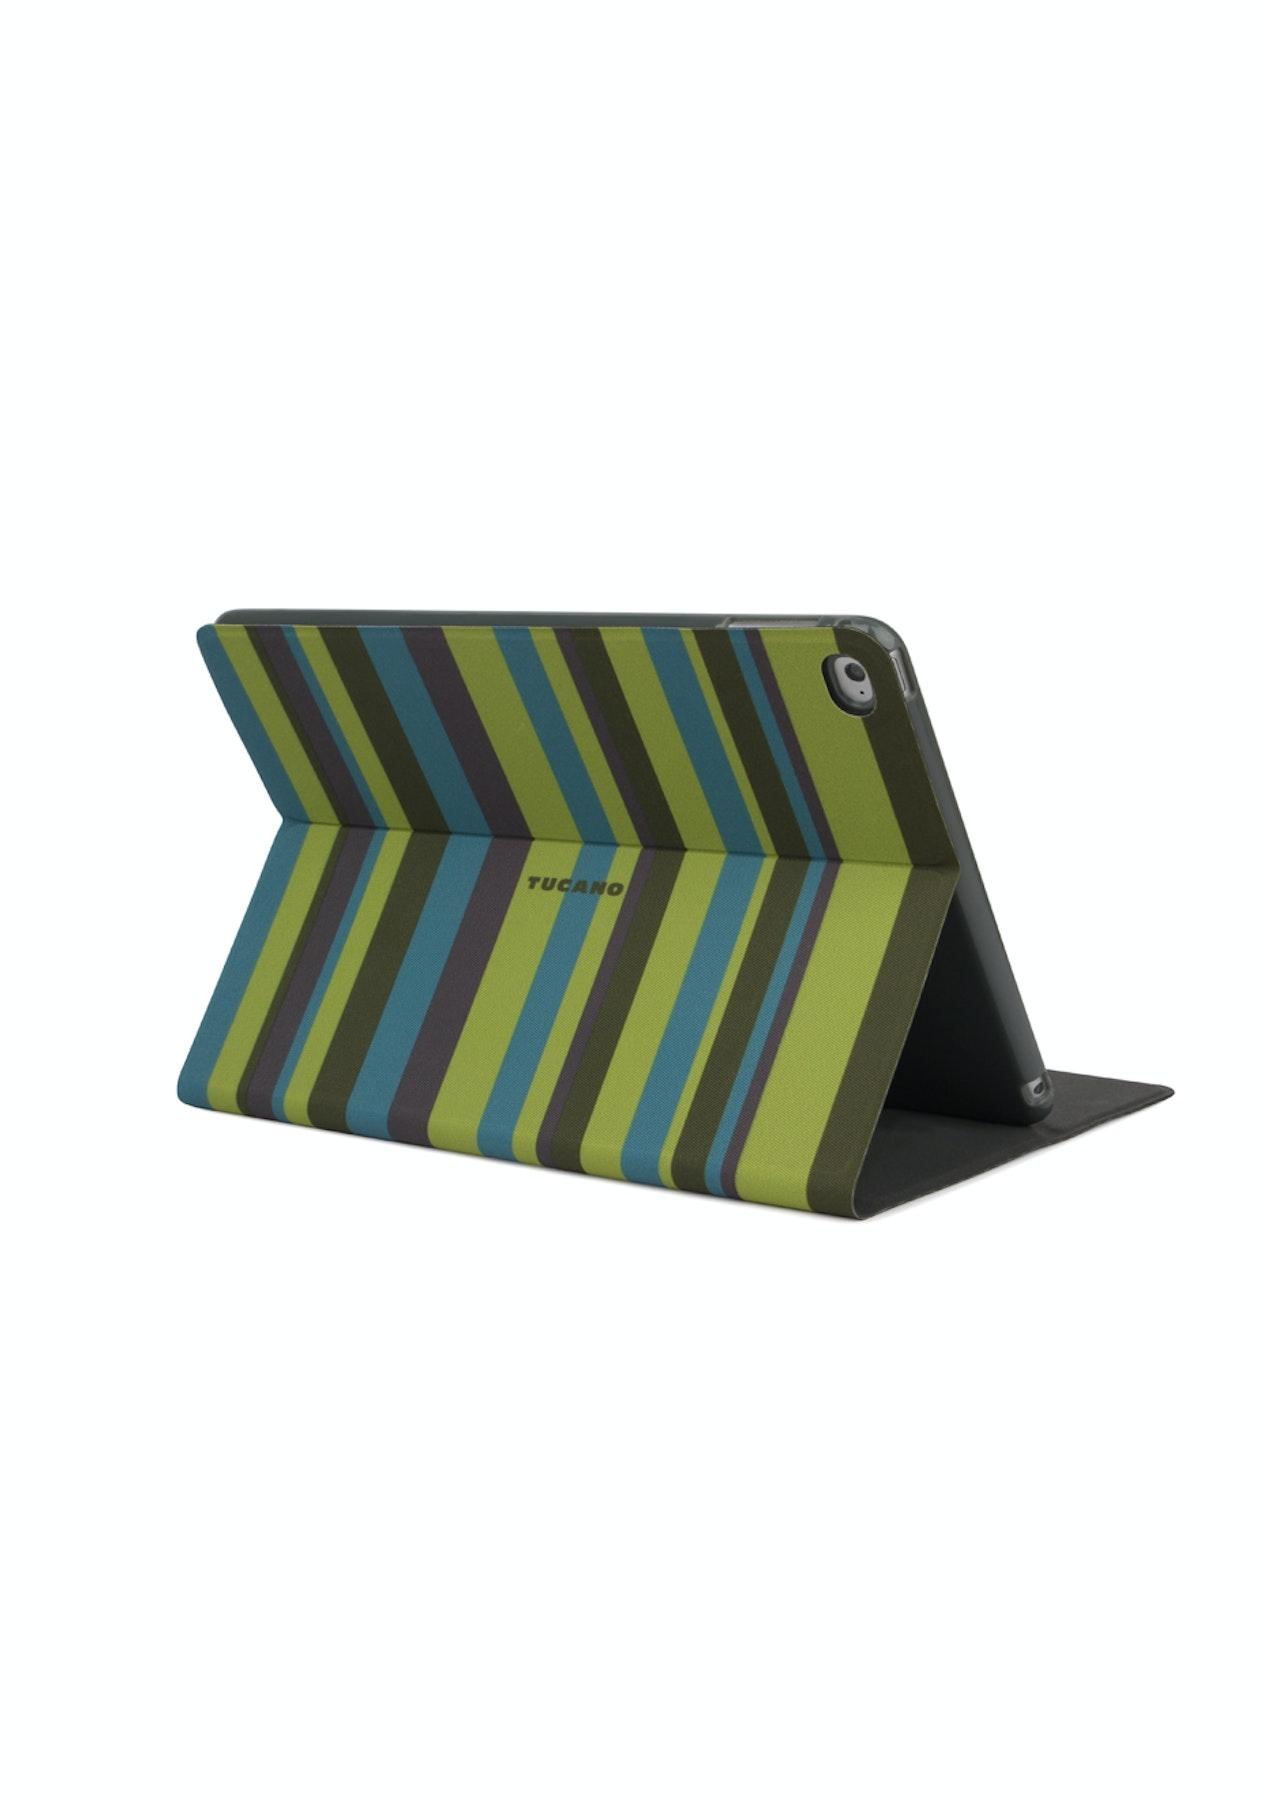 pretty nice 3b977 bbfe6 Tucano iPad Air 2 Angolo Stripe Case - Green